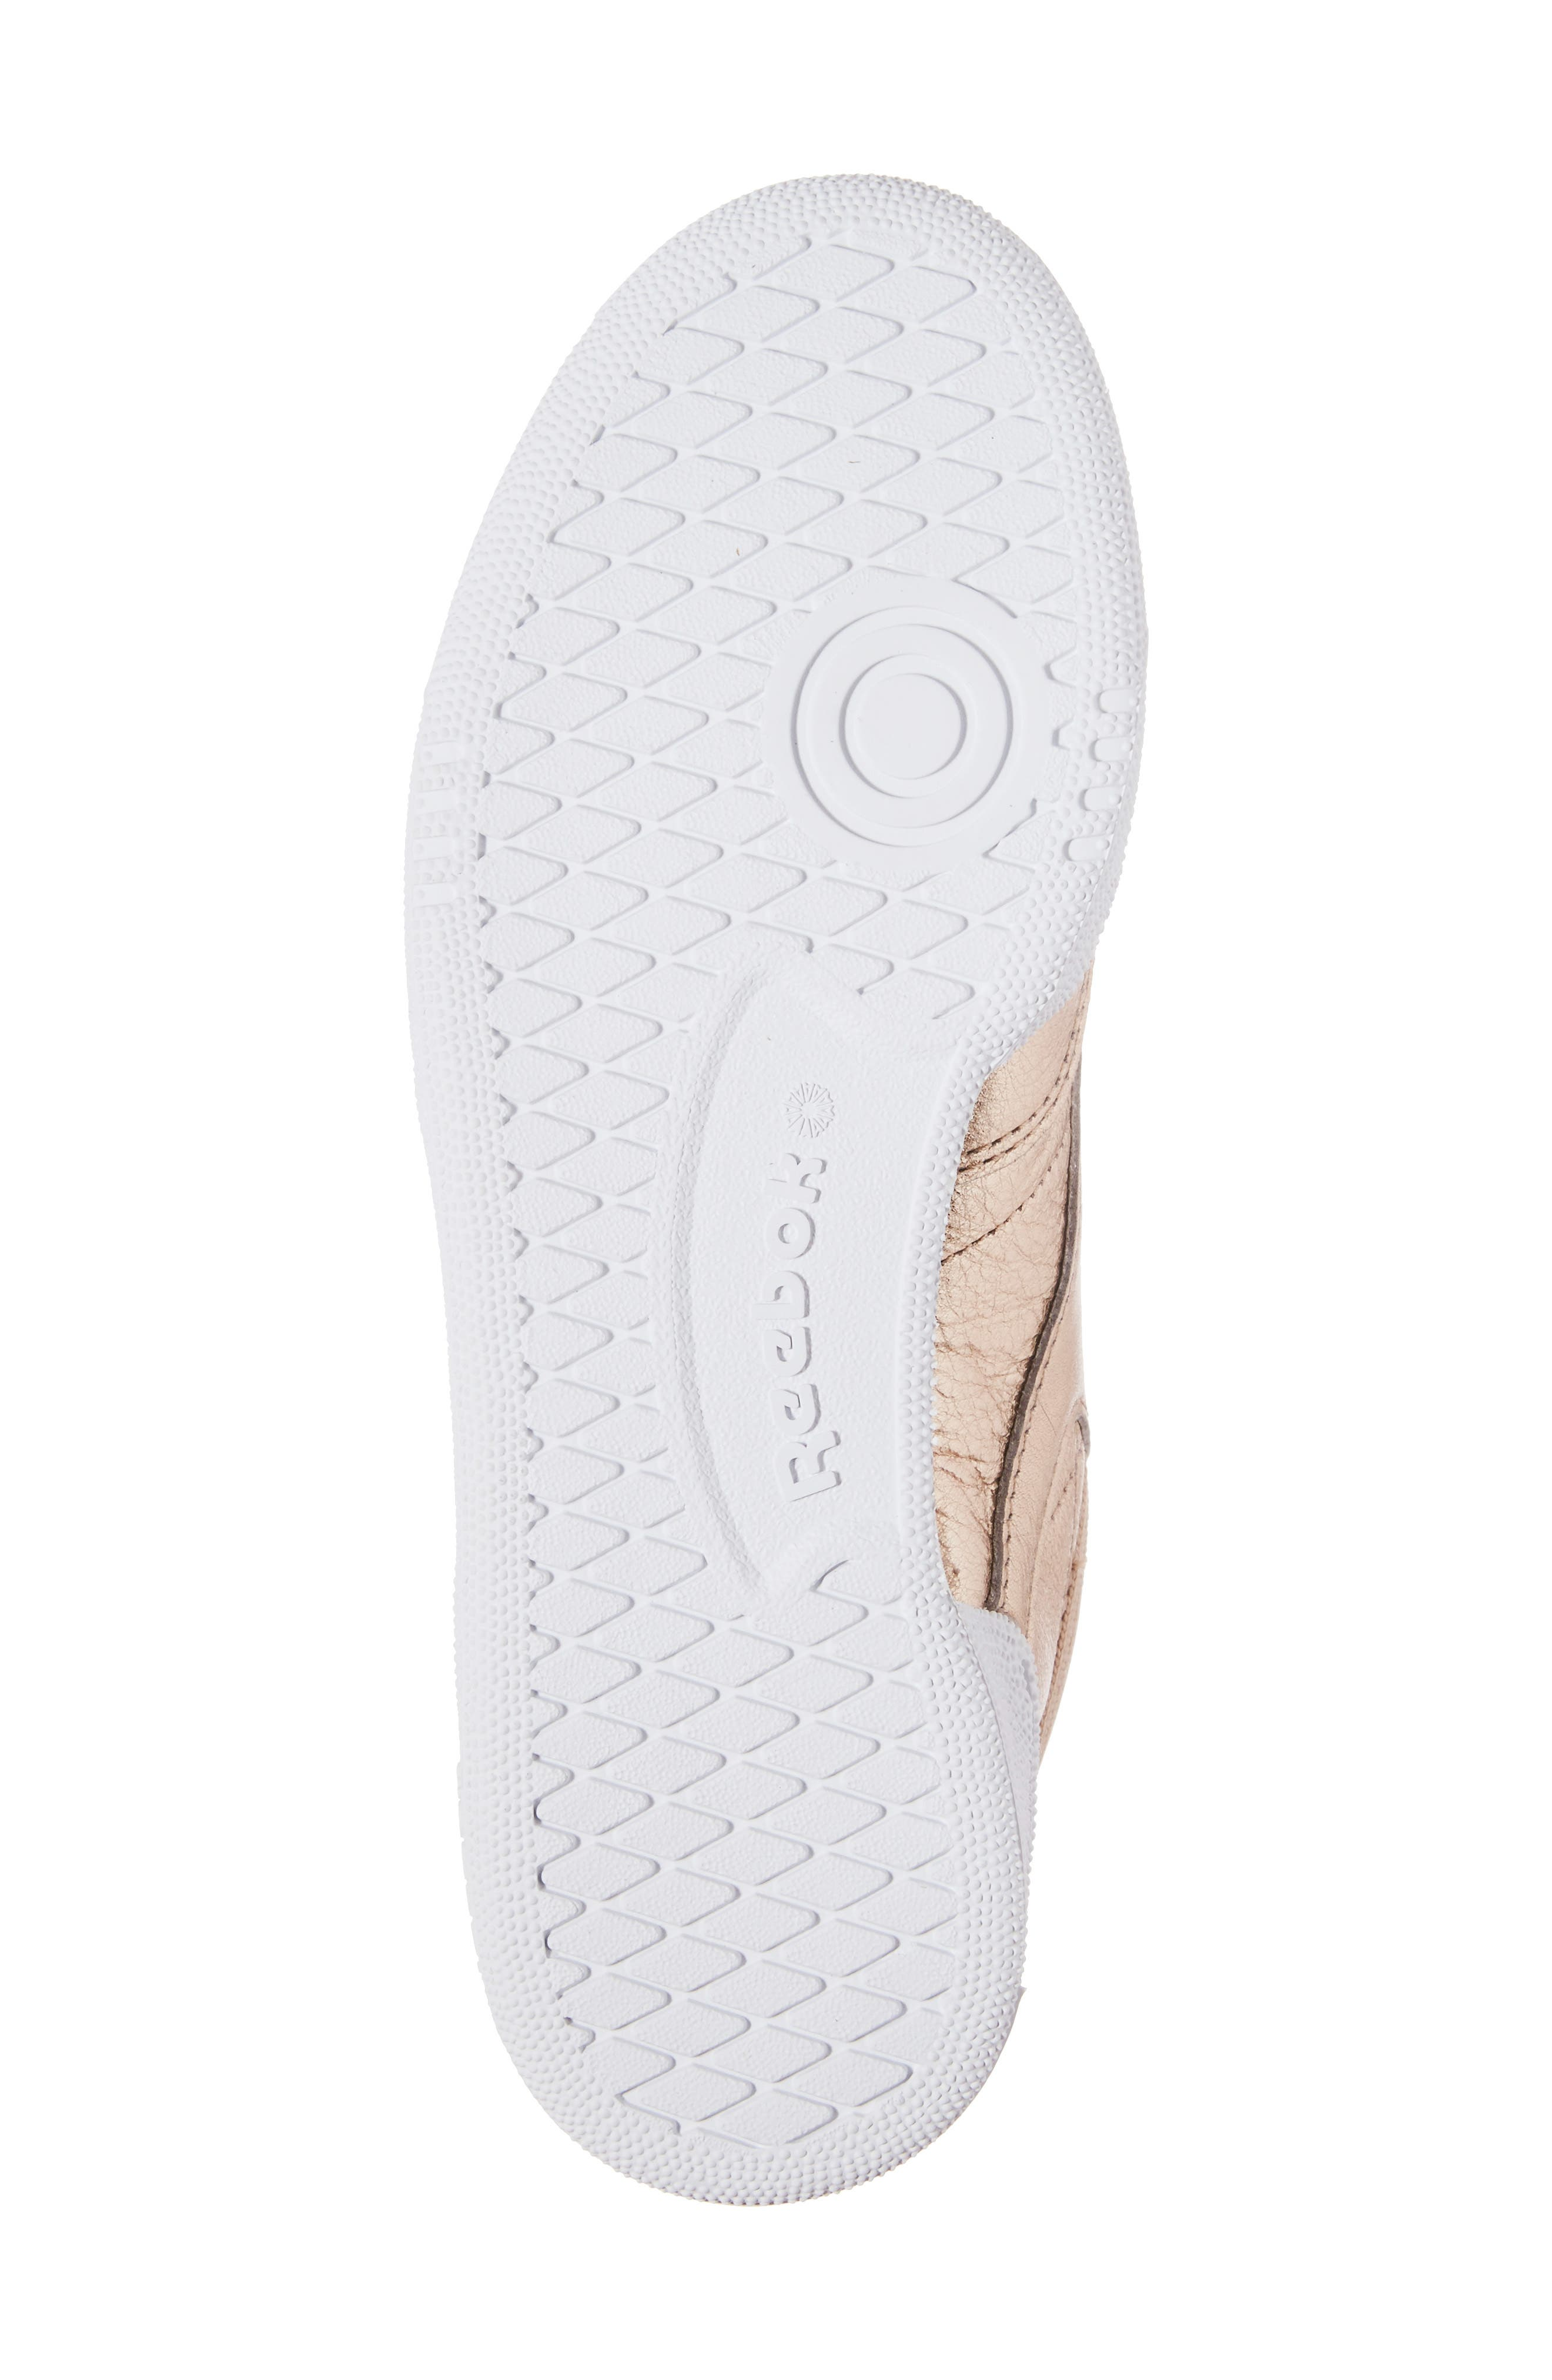 Club C 85 Sneaker,                             Alternate thumbnail 6, color,                             Peach/ White Pearl